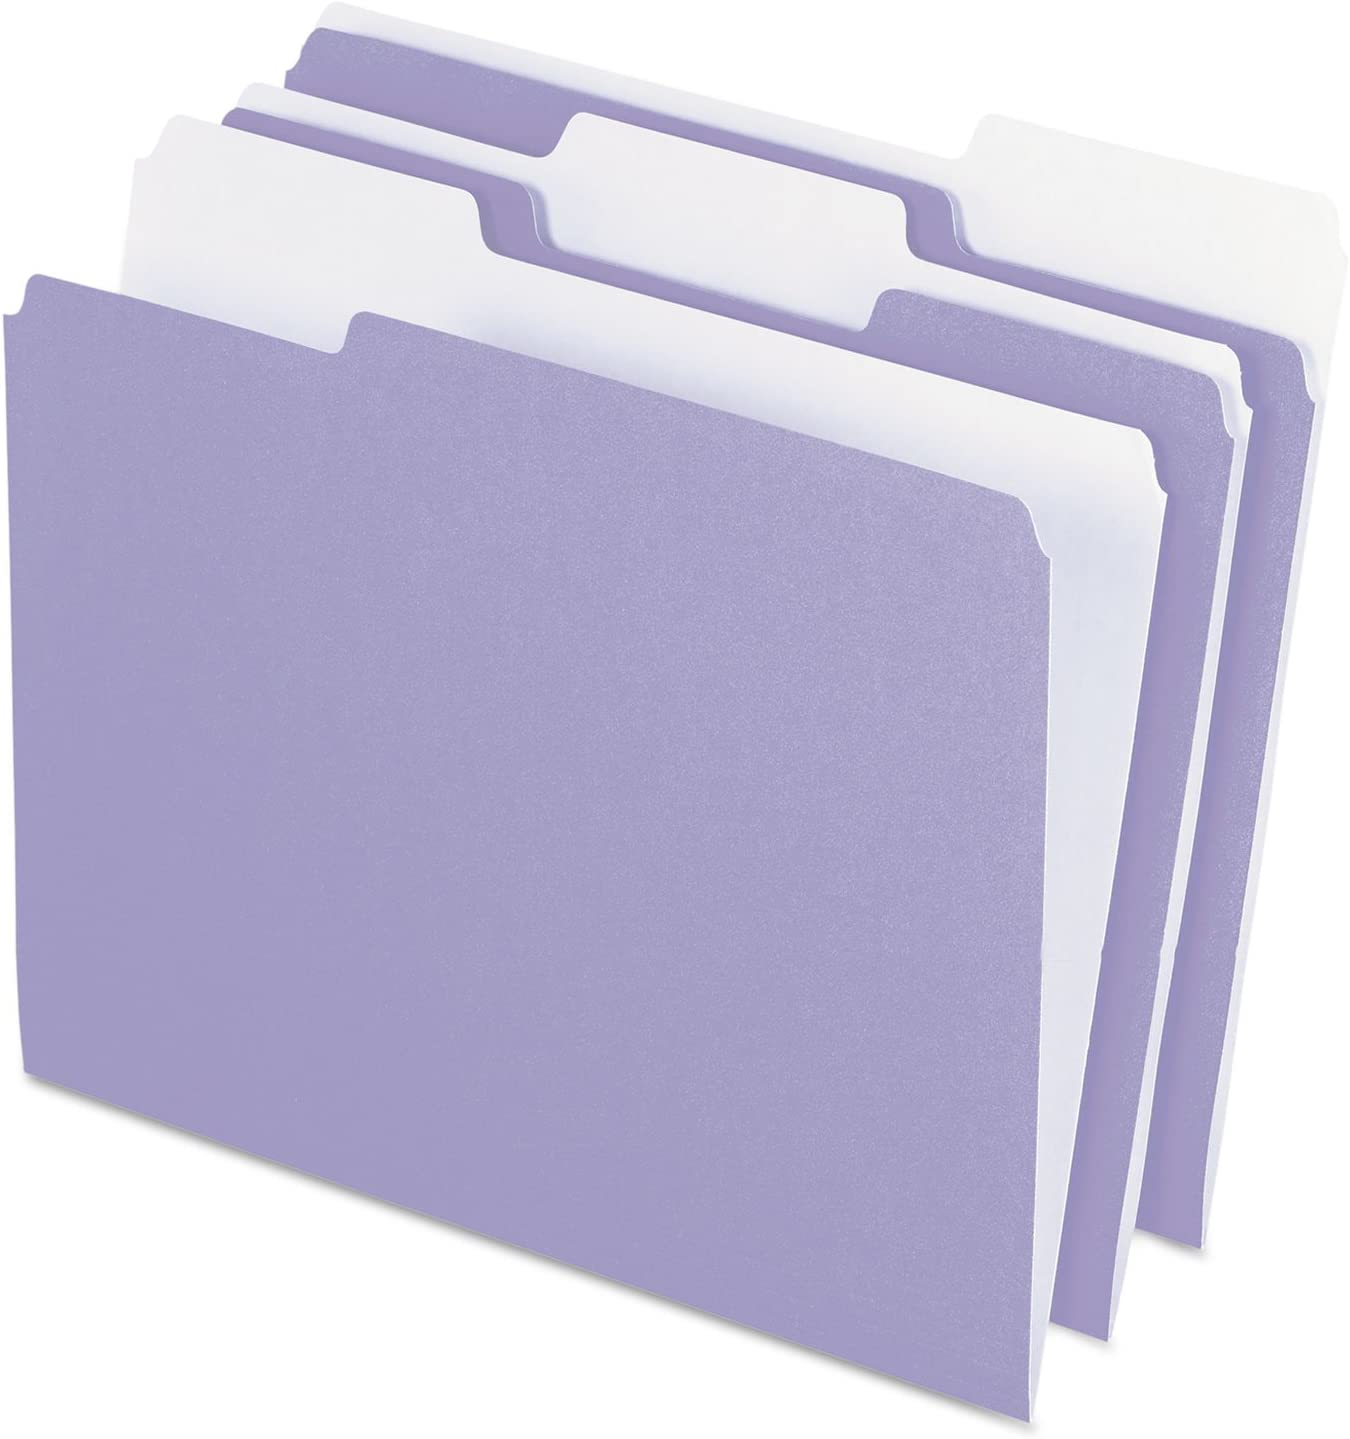 Pendaflexカラーファイルフォルダ、1 / 3カットトップタブ、手紙、ラベンダー/ライトラベンダー、100 /ボックス